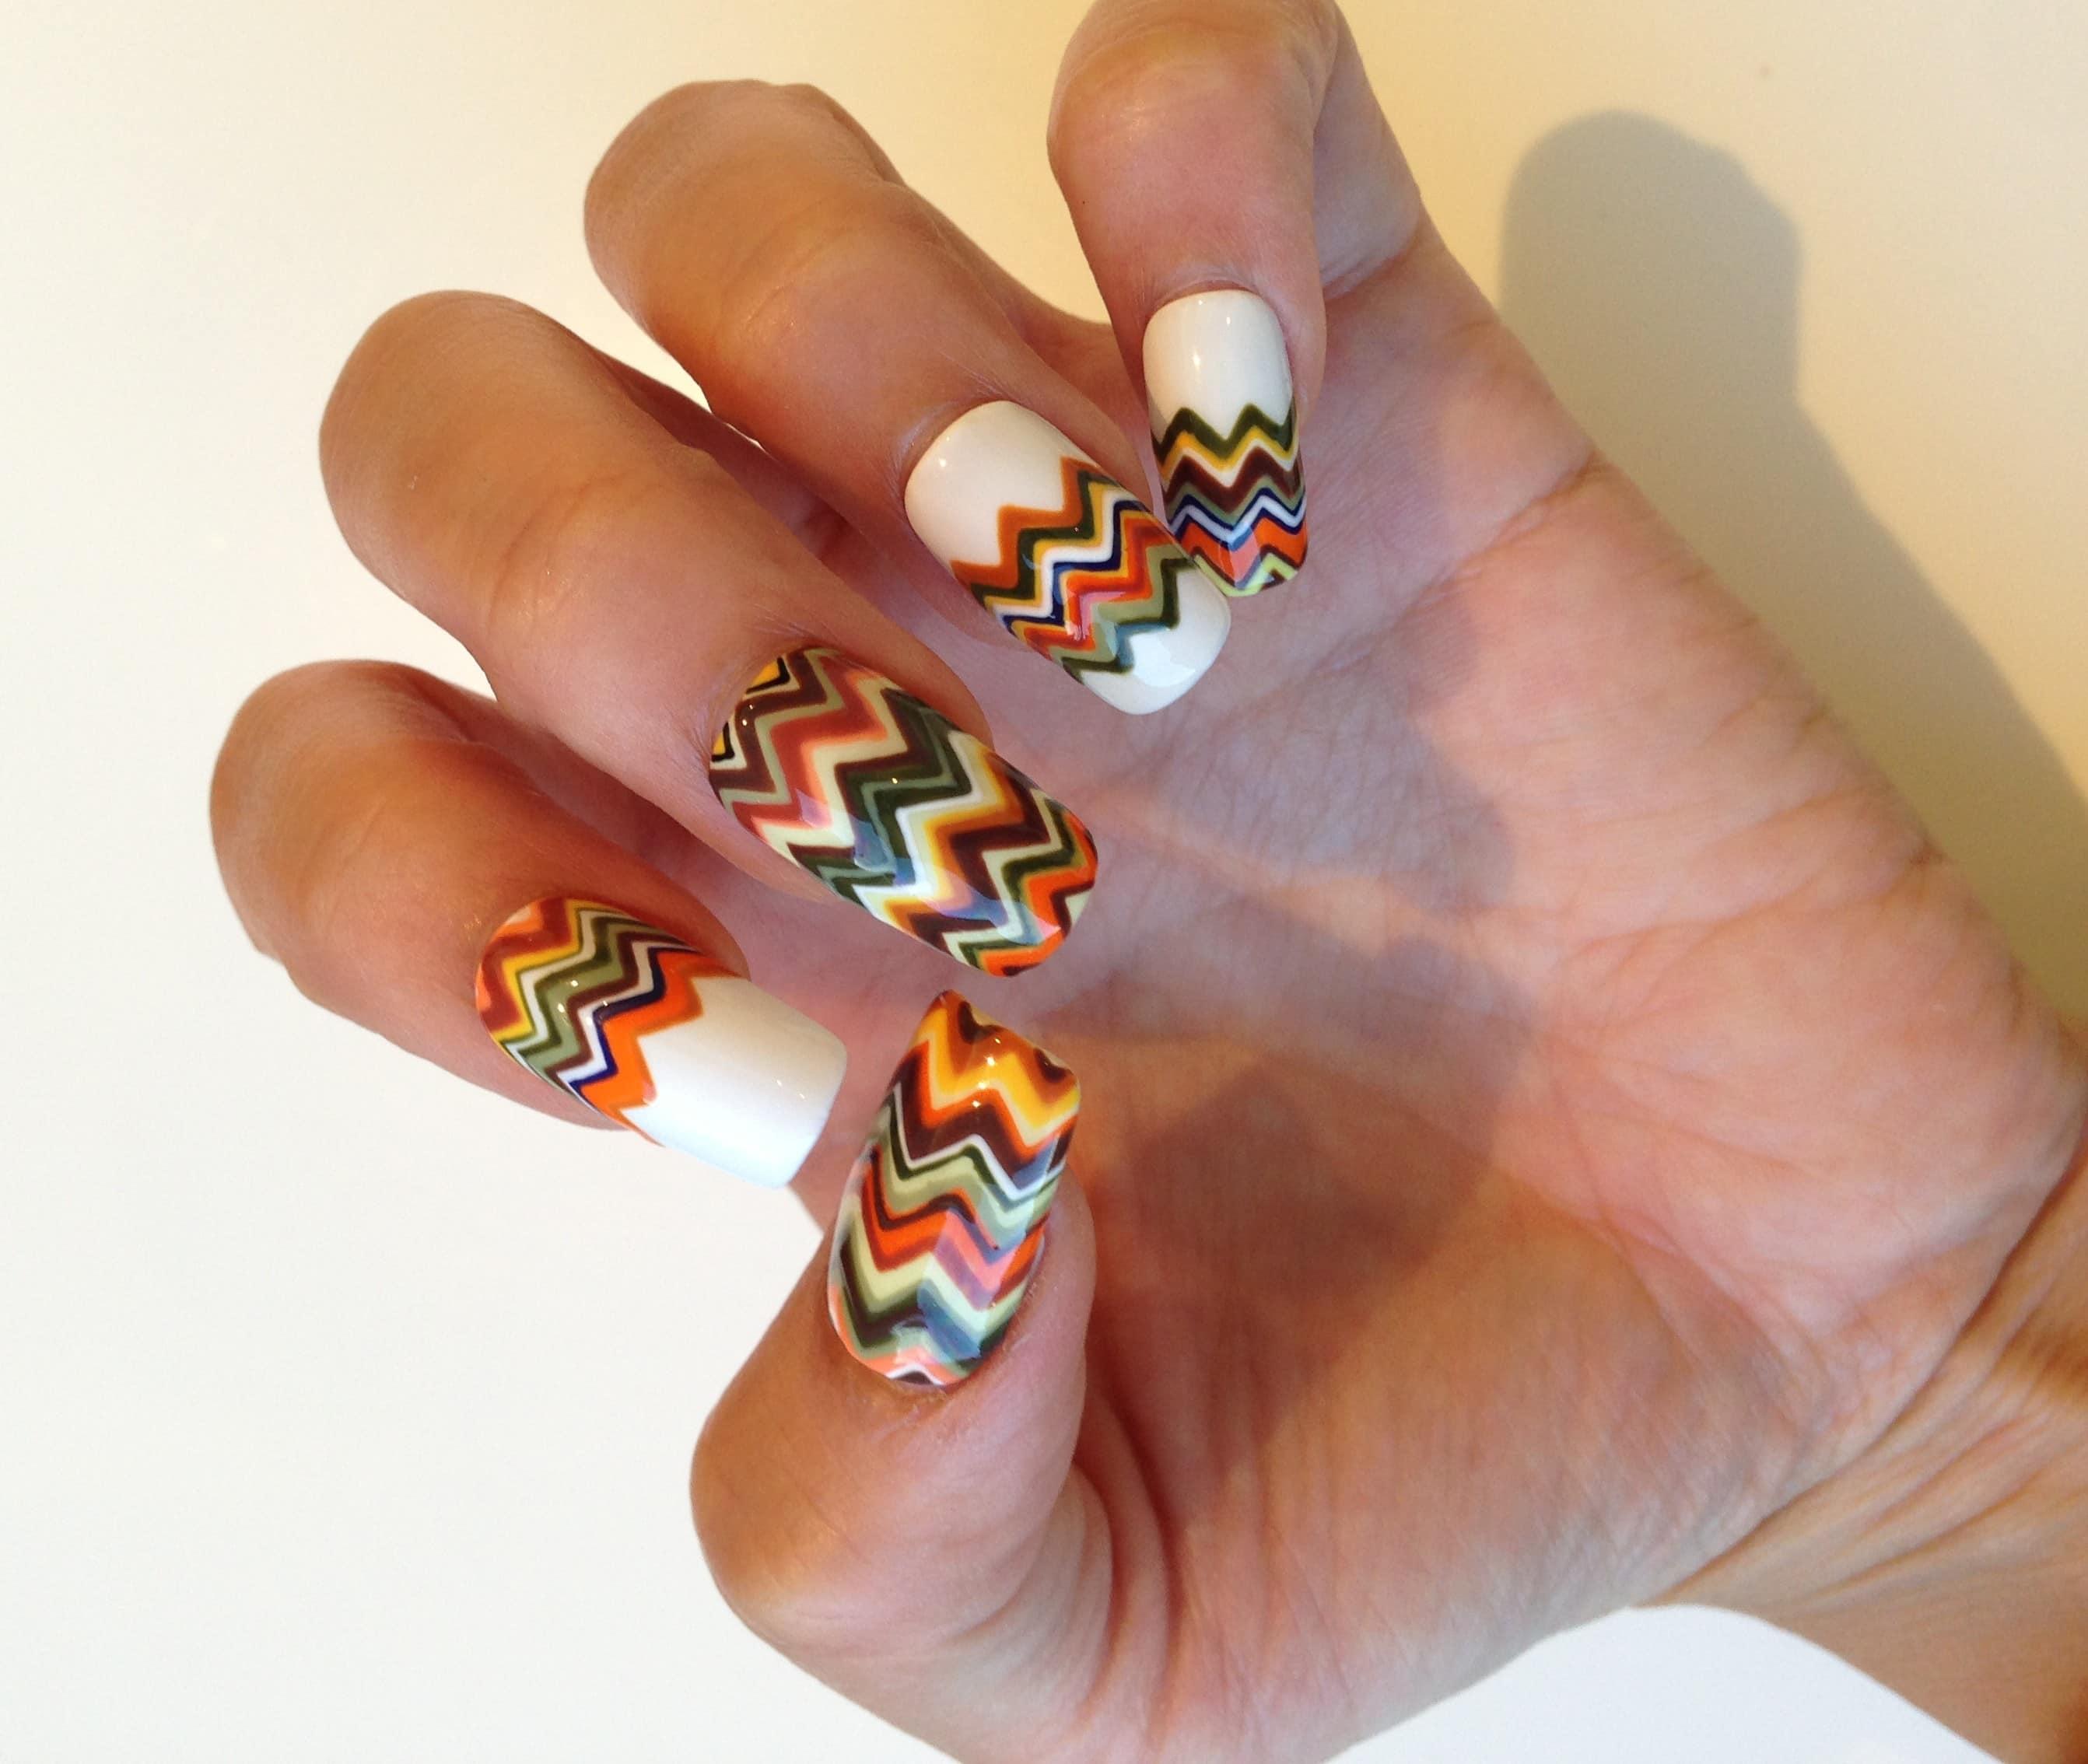 Salon Fanatic - Nail Trends, Salon Services & Nail Art News